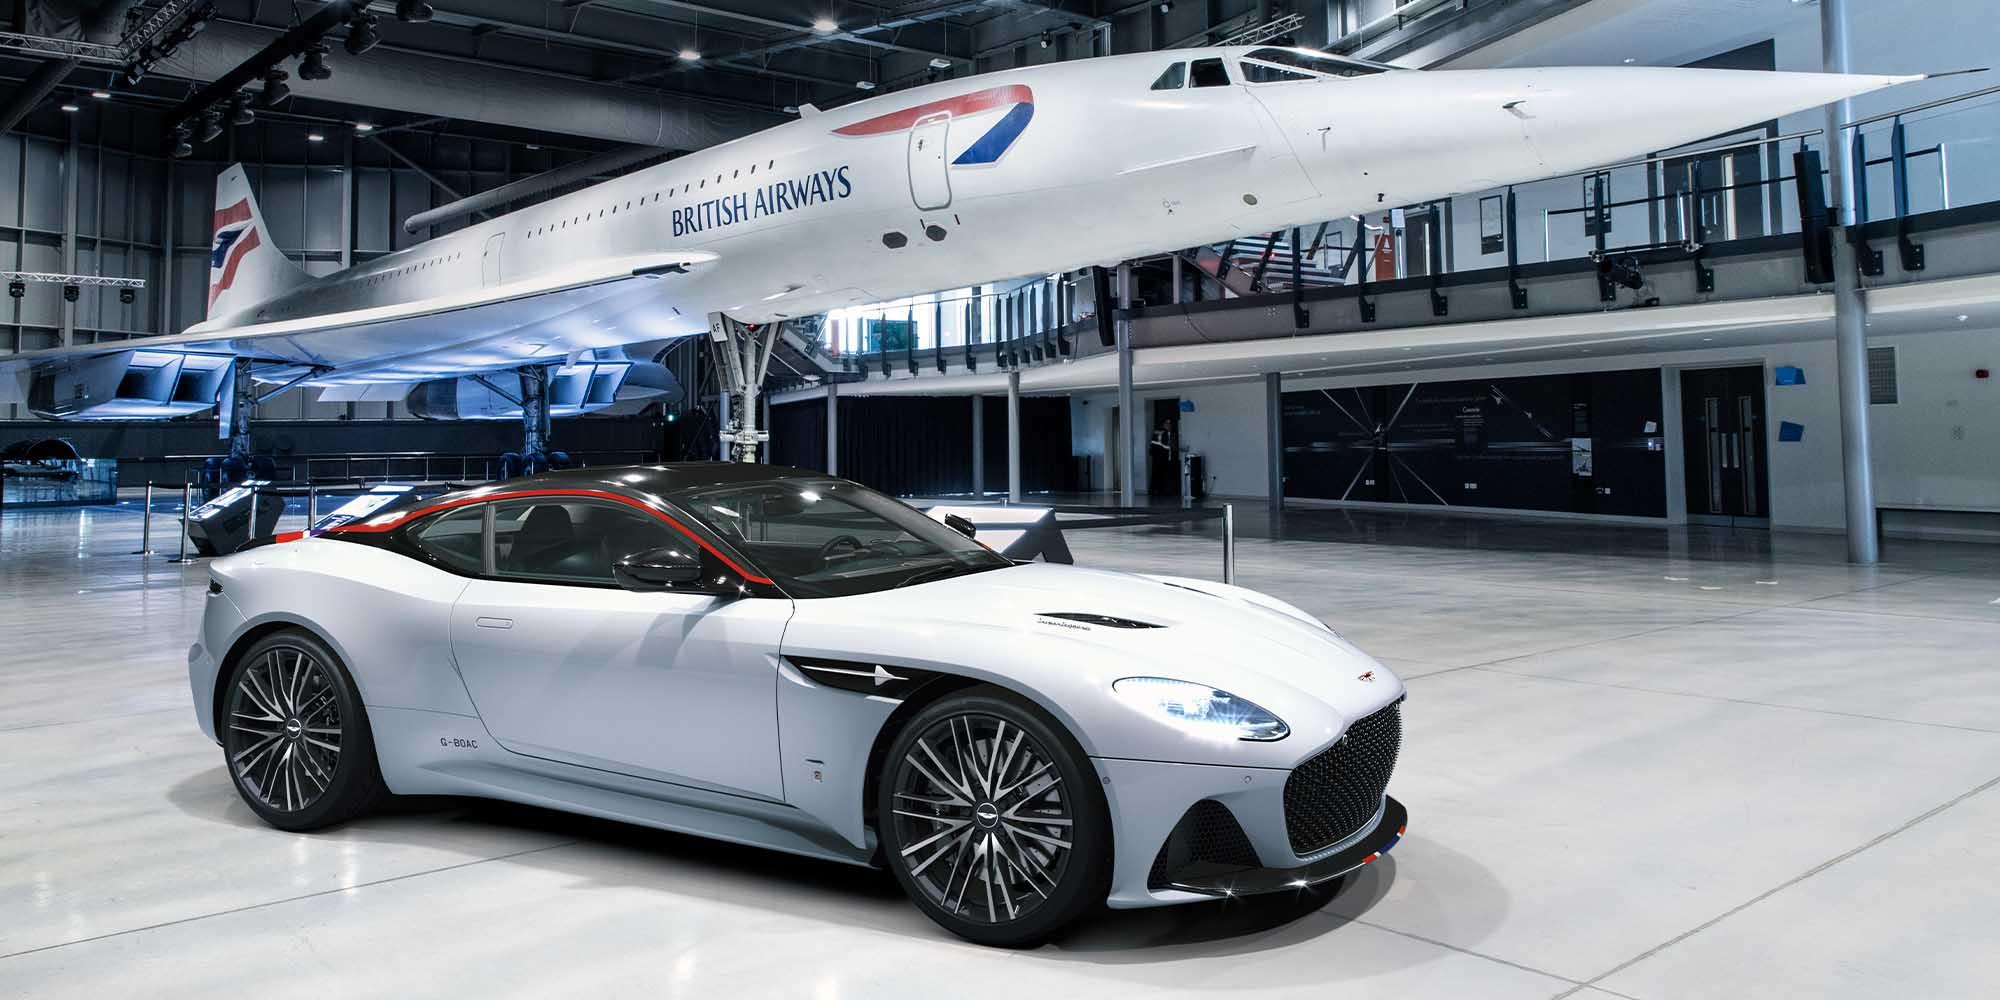 Aston Martin commemorates Concorde with special edition Superleggera